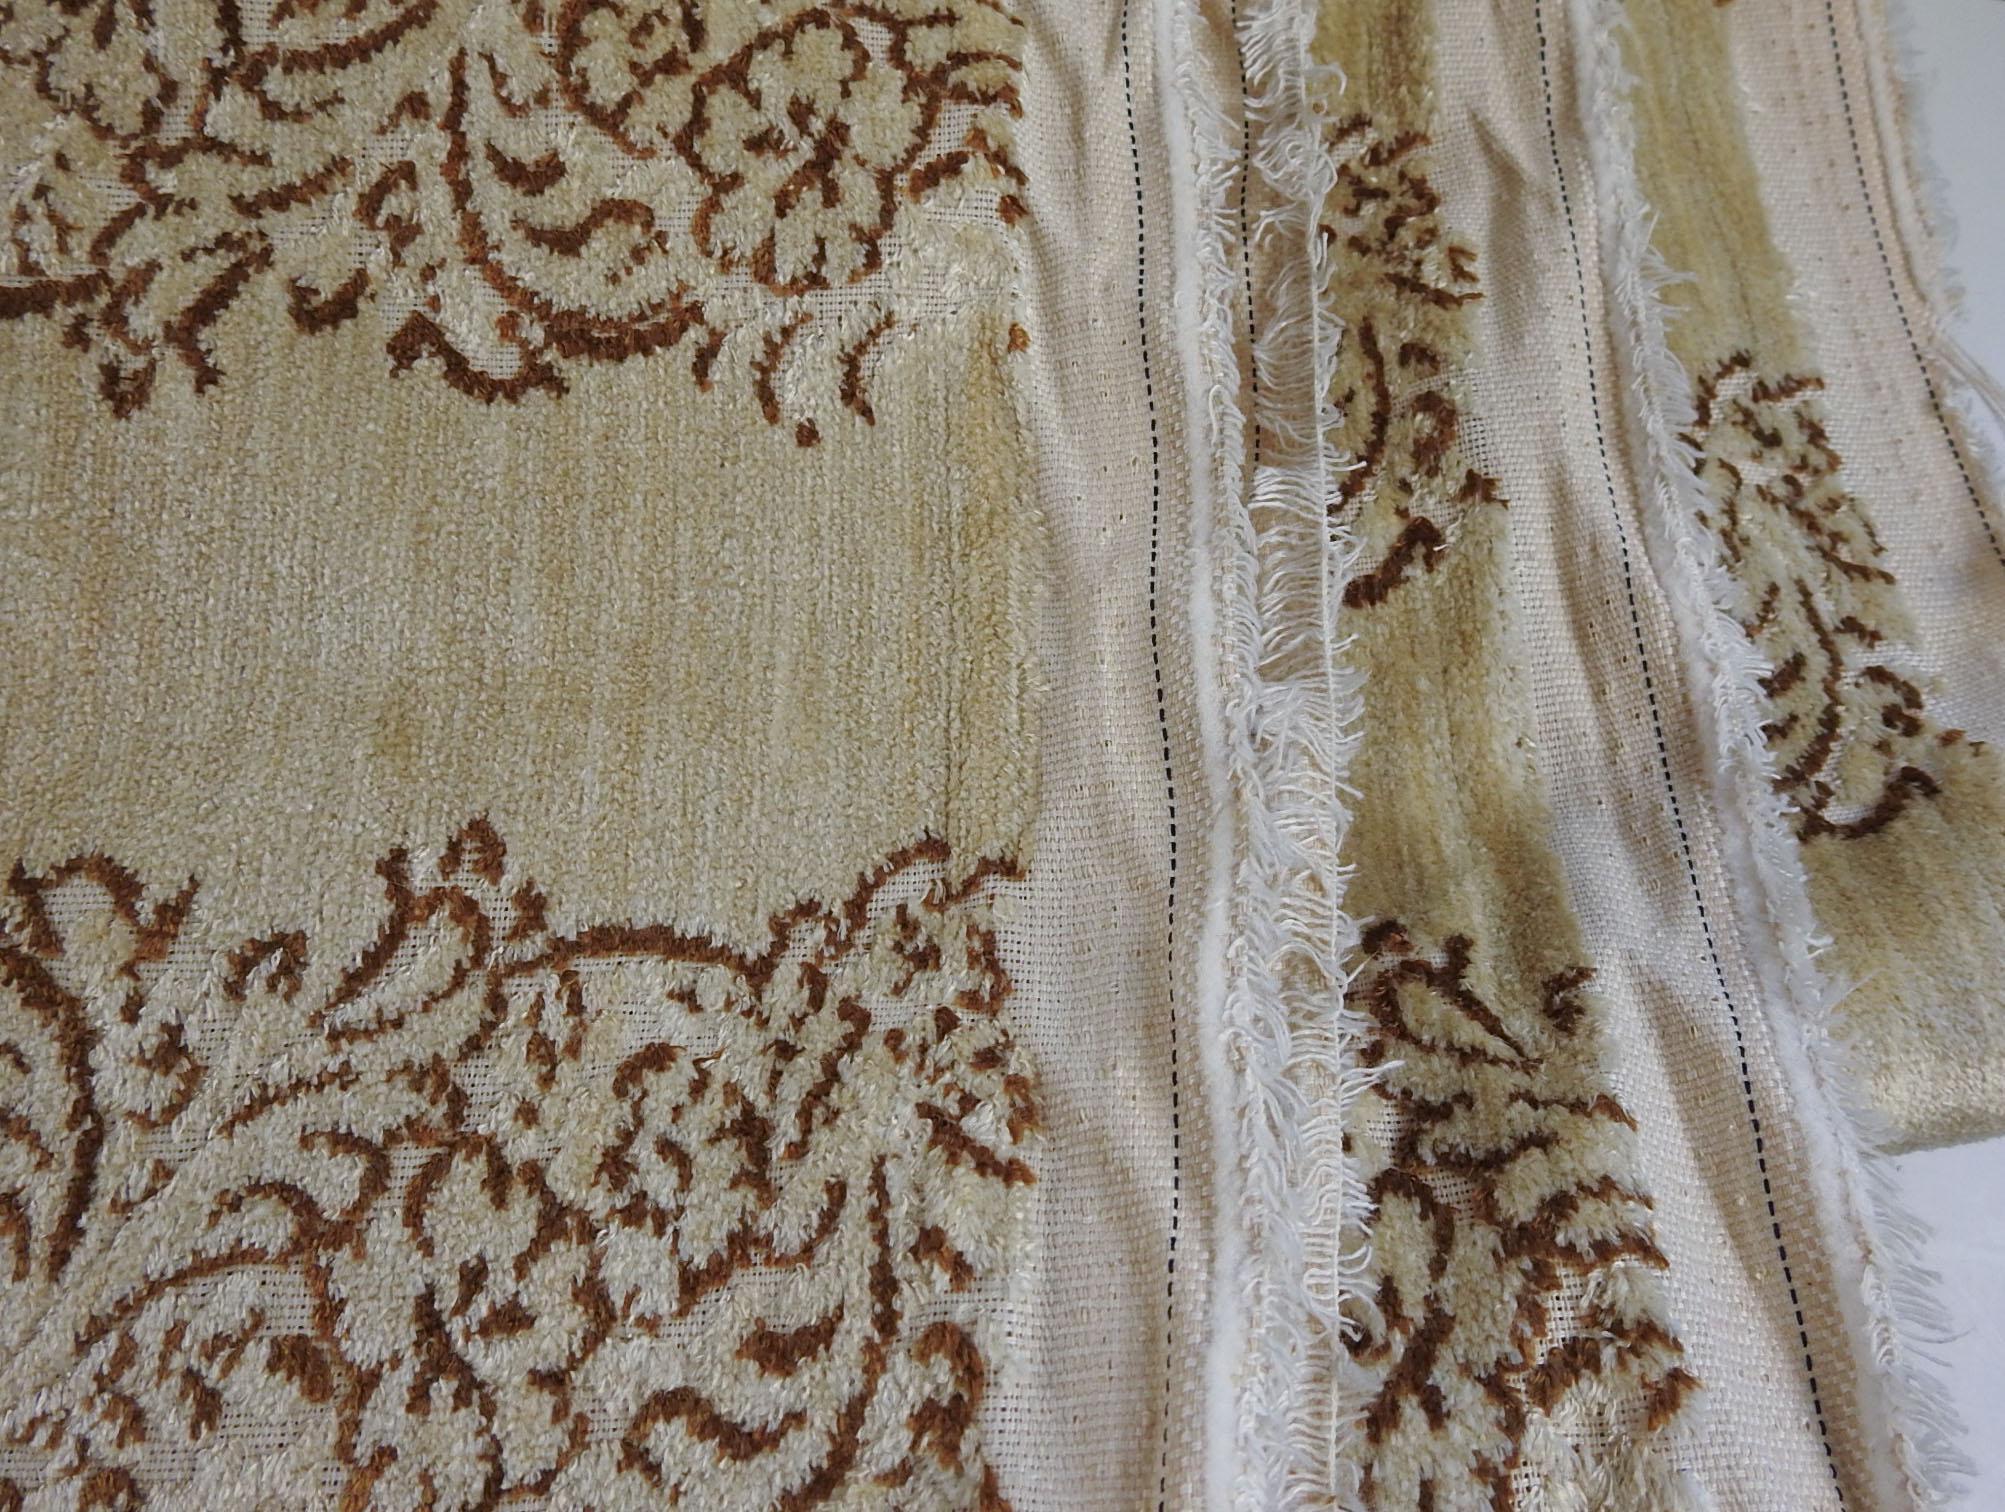 Burnout Velvet Upholstery Fabric 8 Yards Chairish